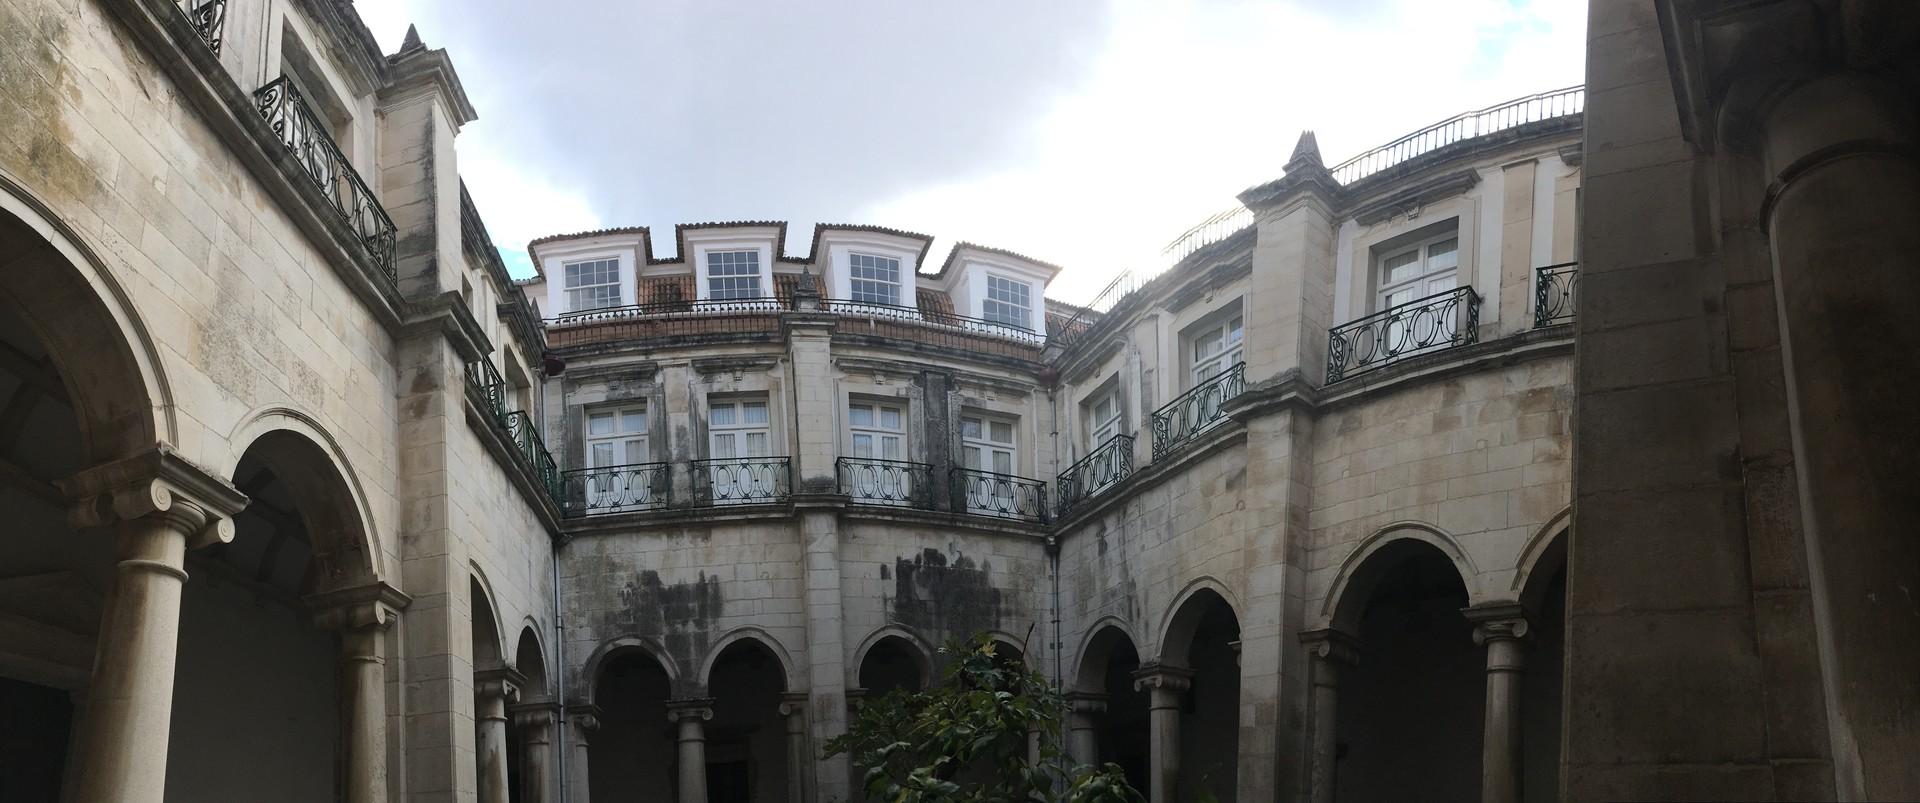 A hidden building in the university